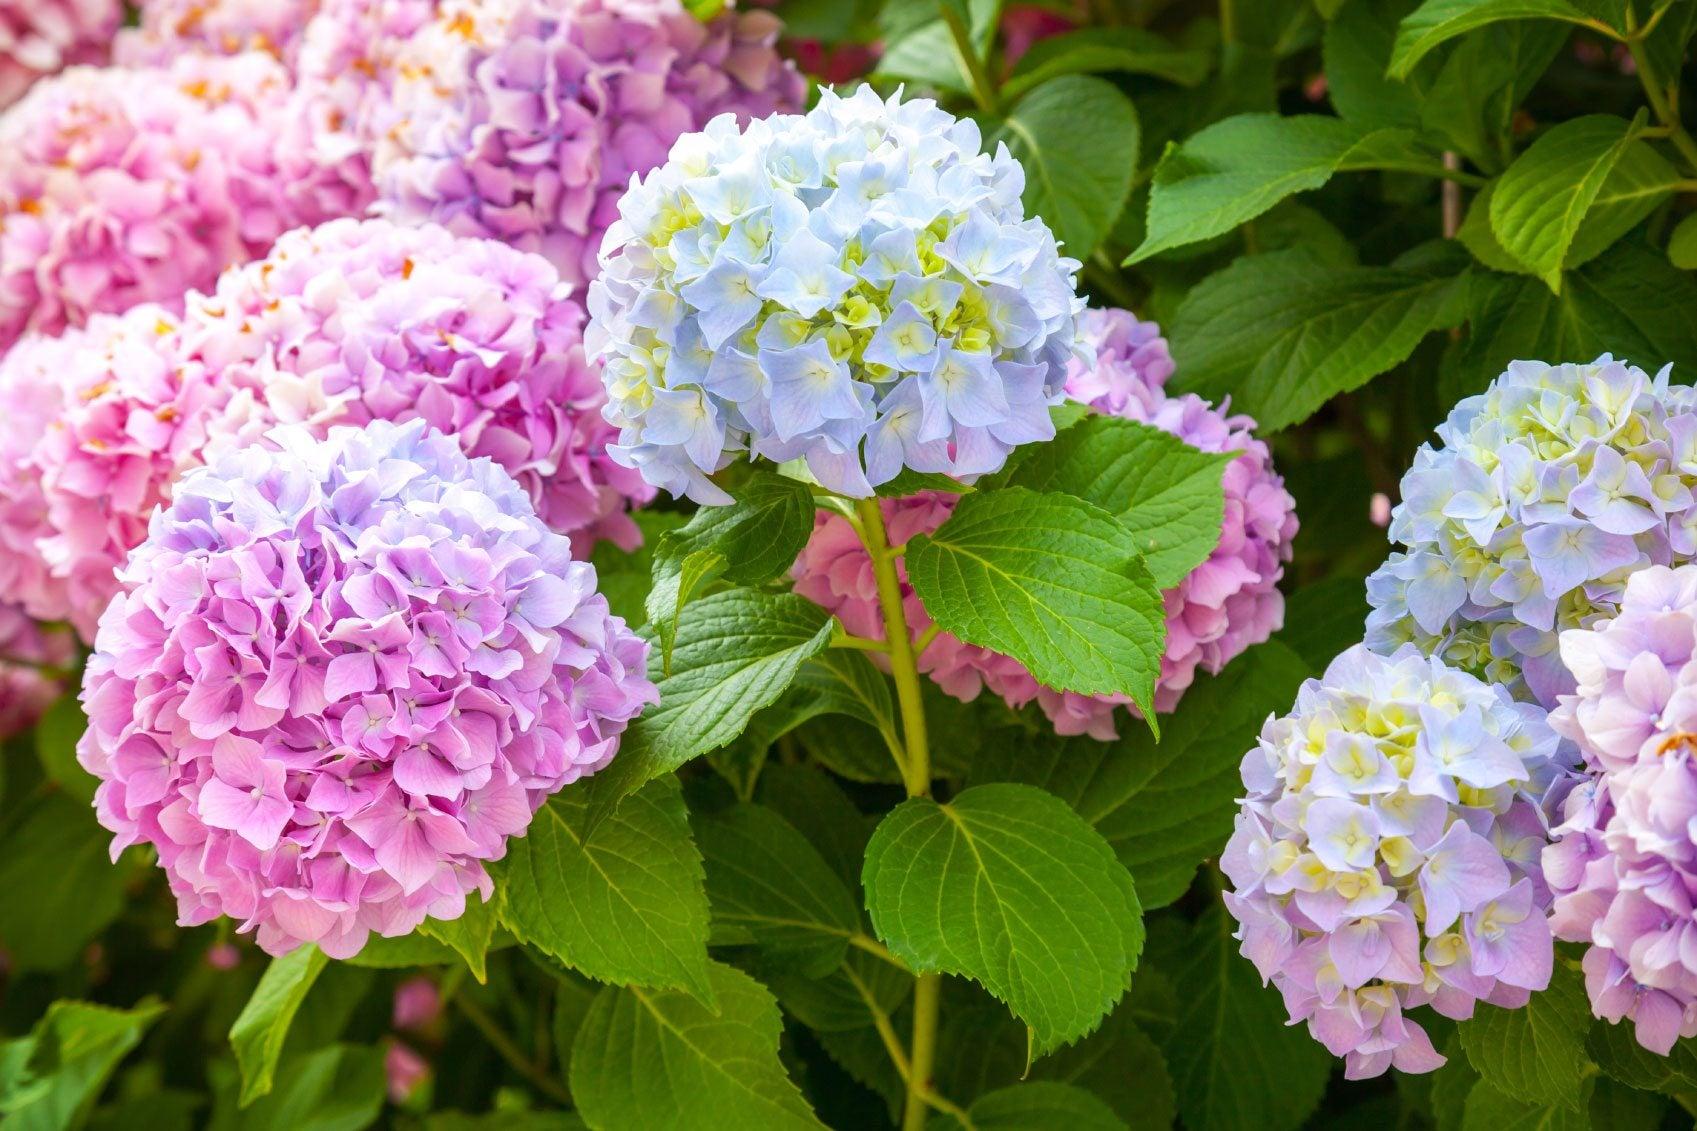 Change Color Of Hydrangea Bush: How To Make Hydrangea